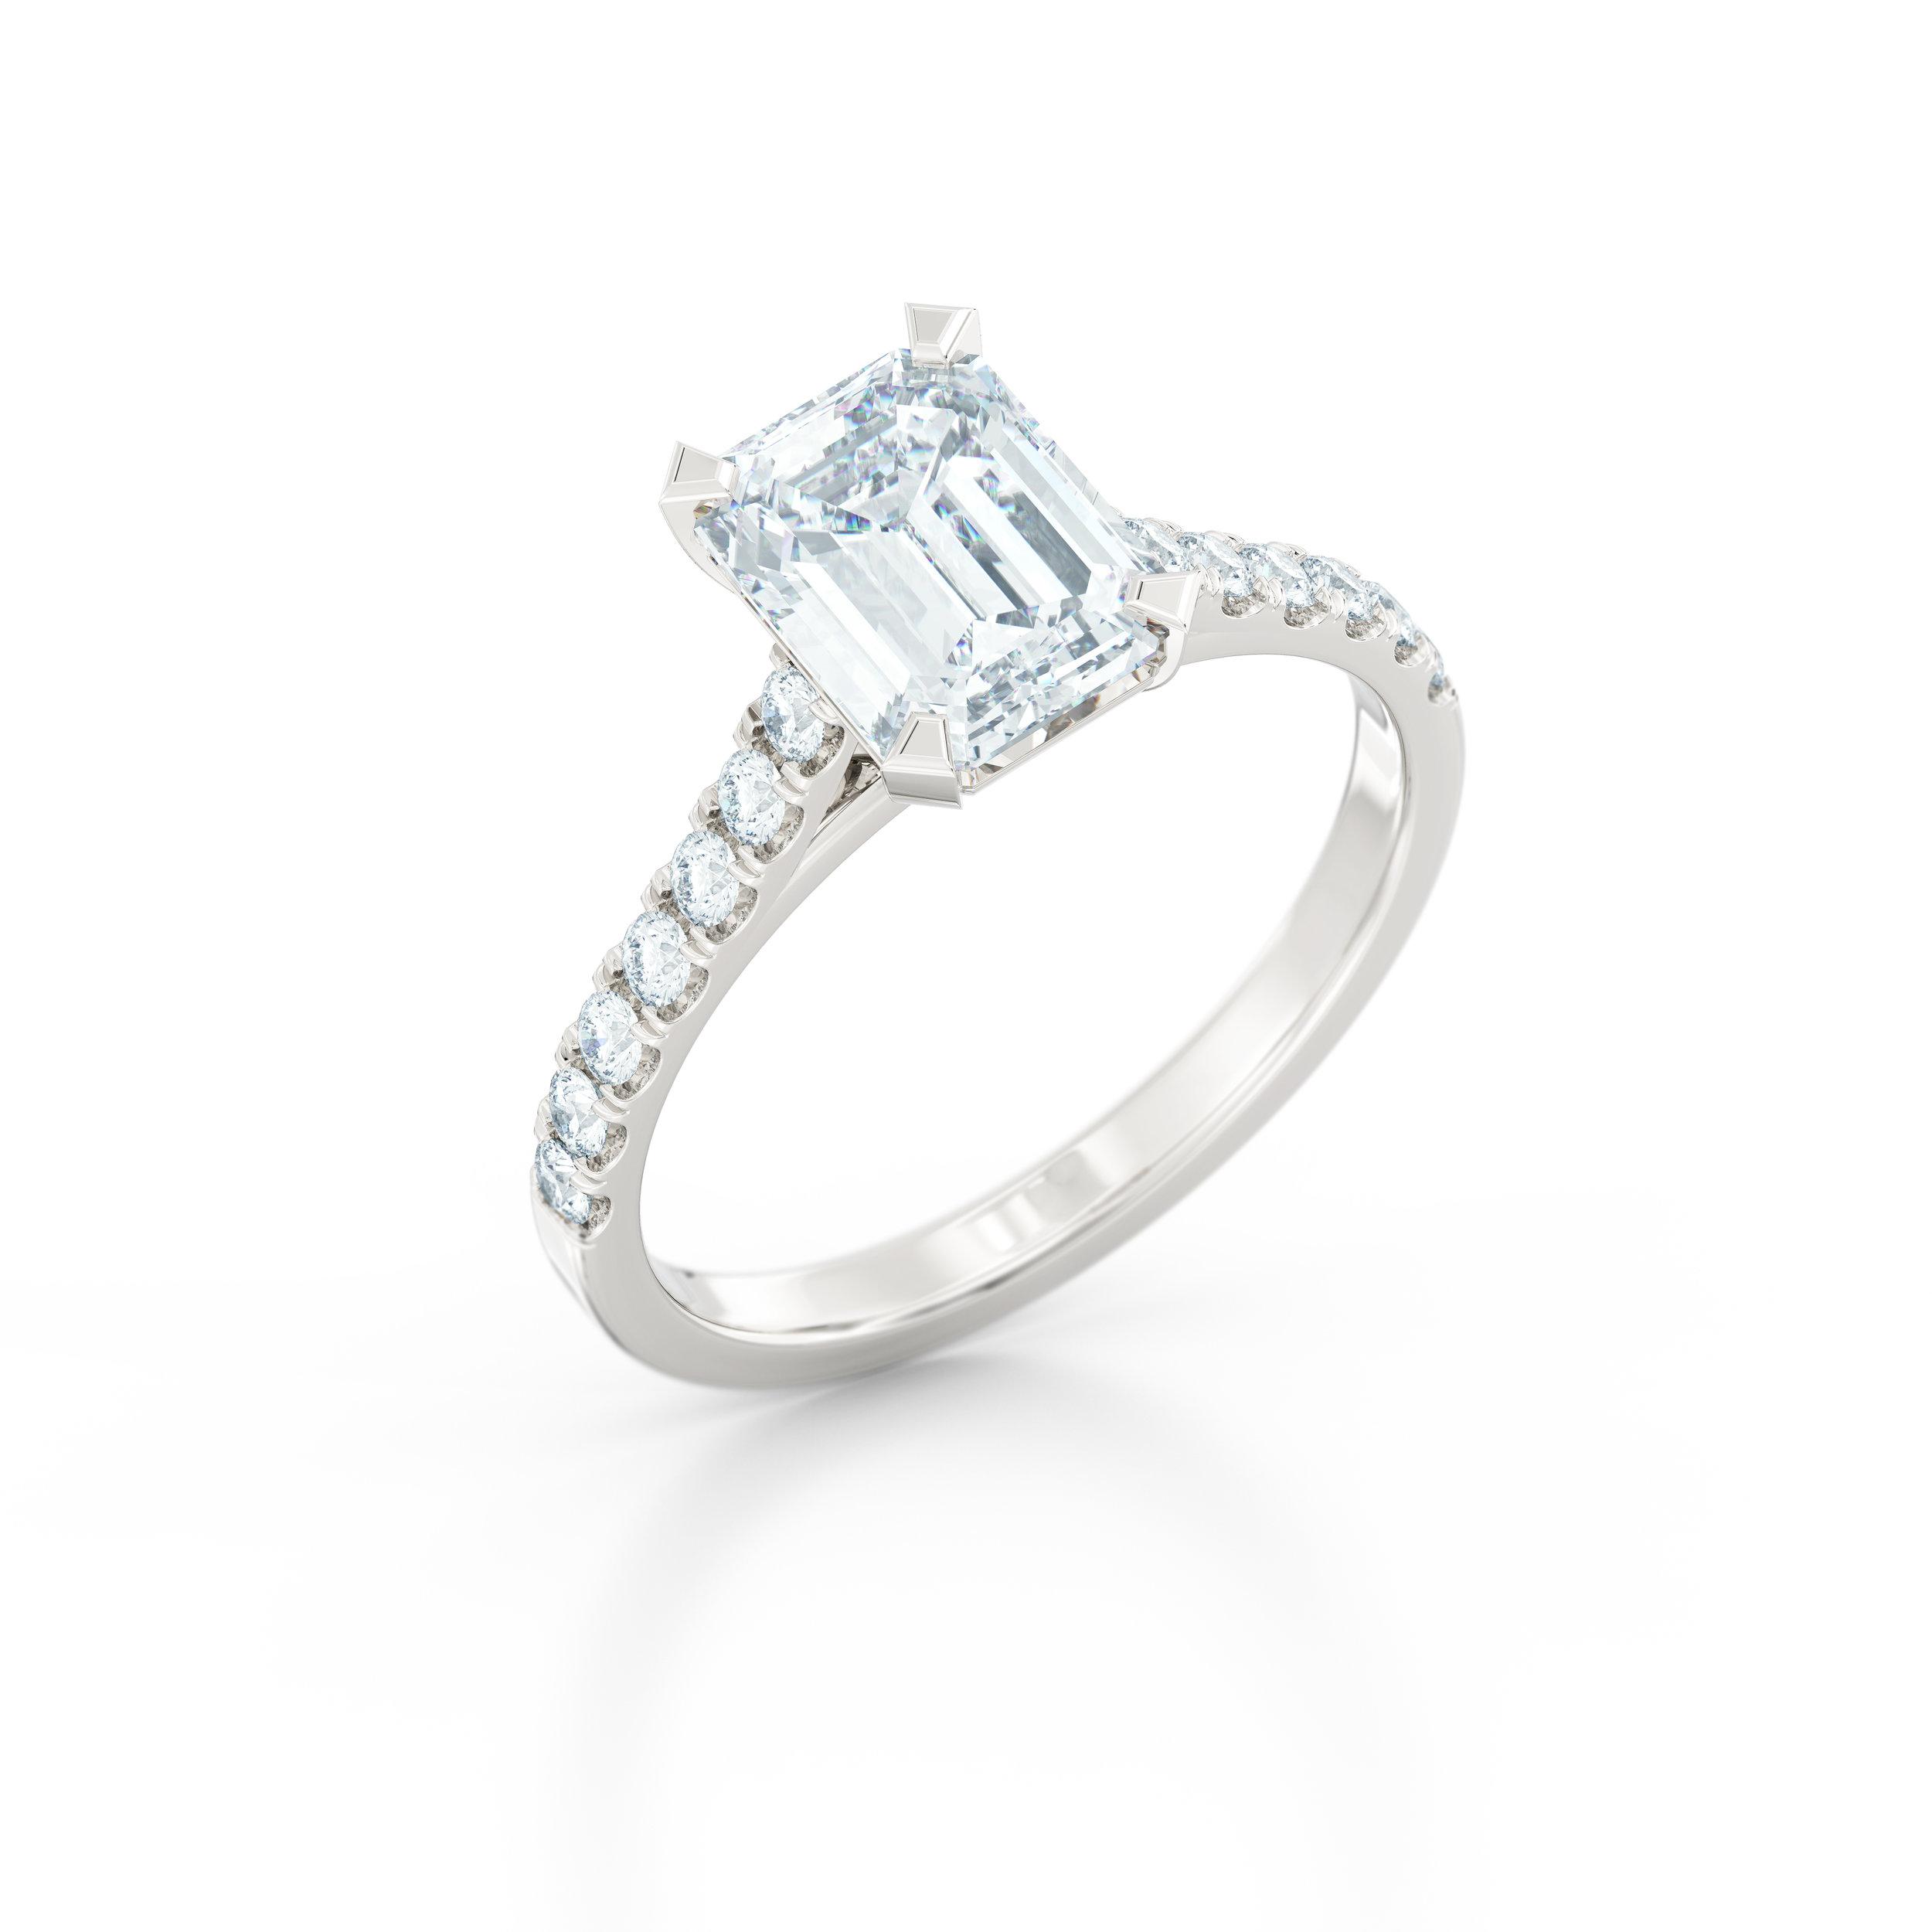 Emerald cut diamond shoulder engagement ring